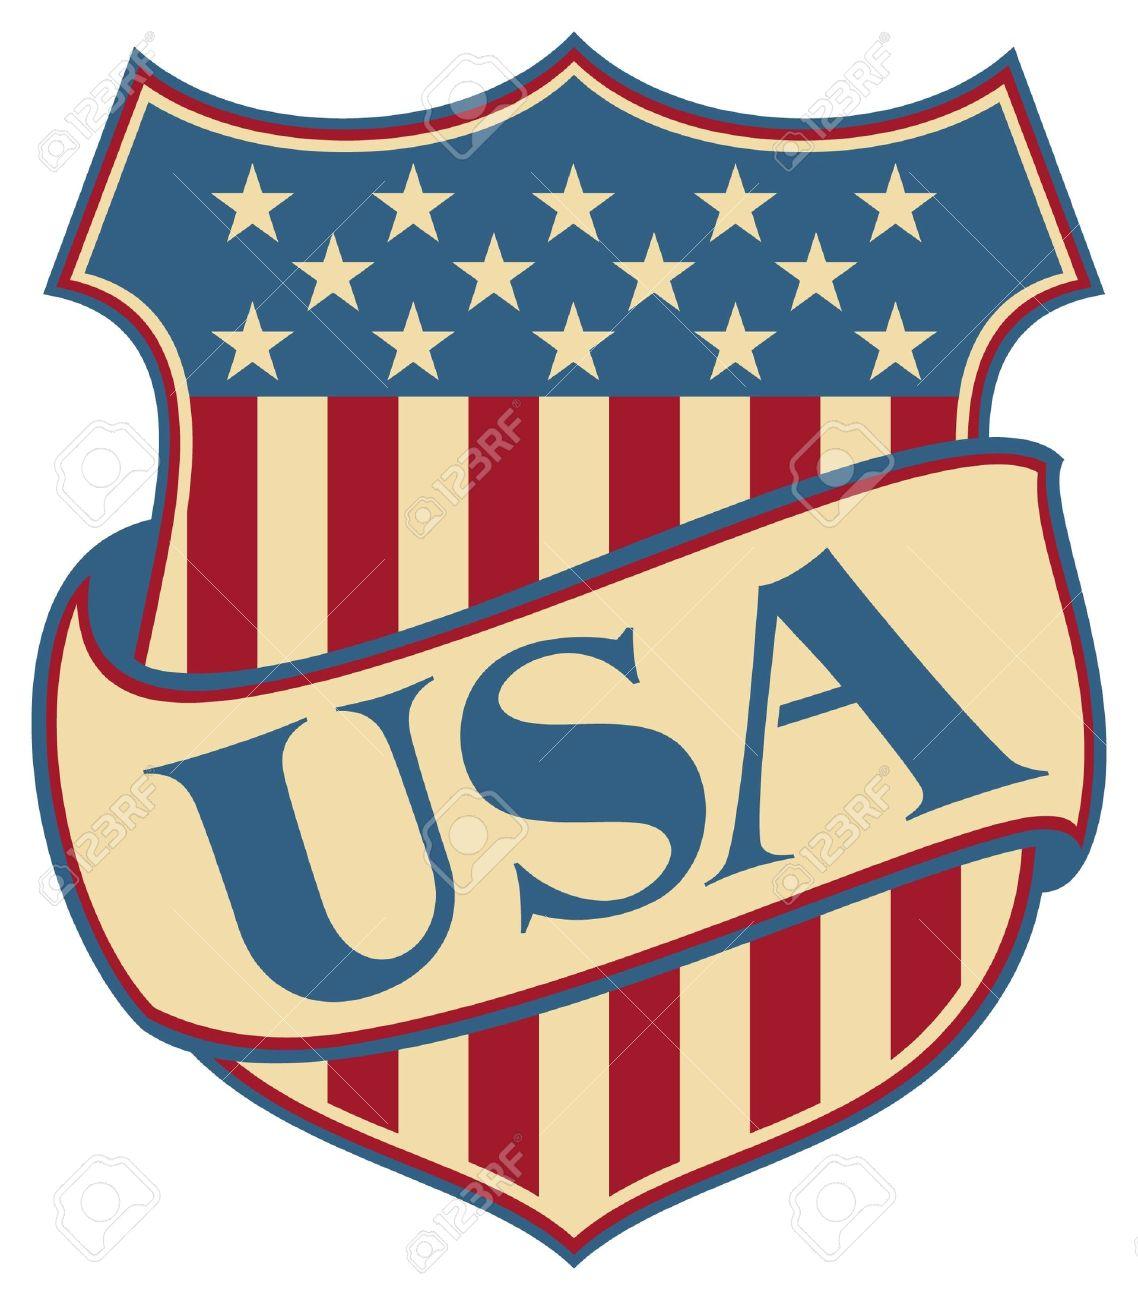 American Symbols Of Patriotism american patriotic symbol